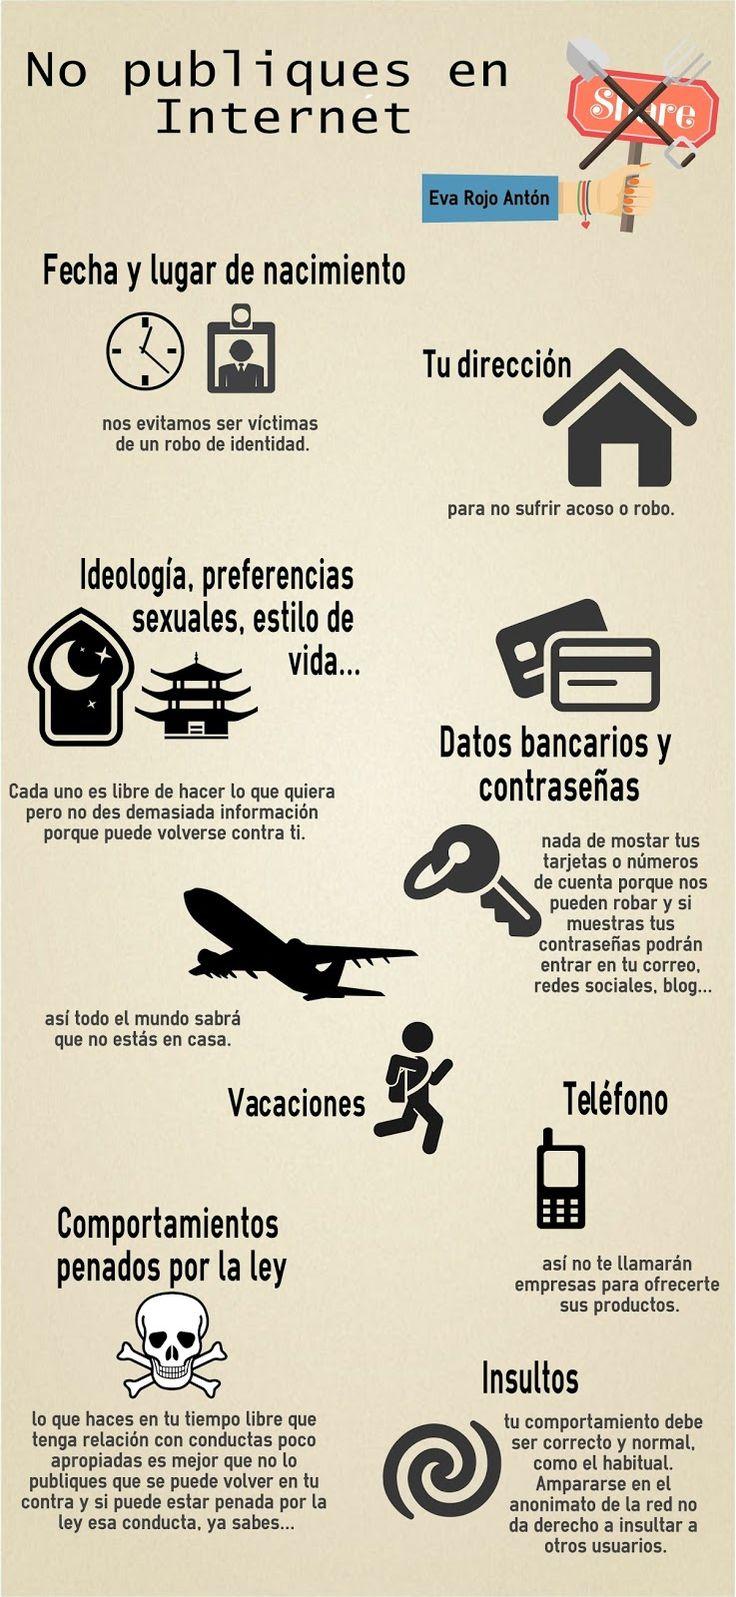 Técnico en formación: Infografia: no publiques en Internet